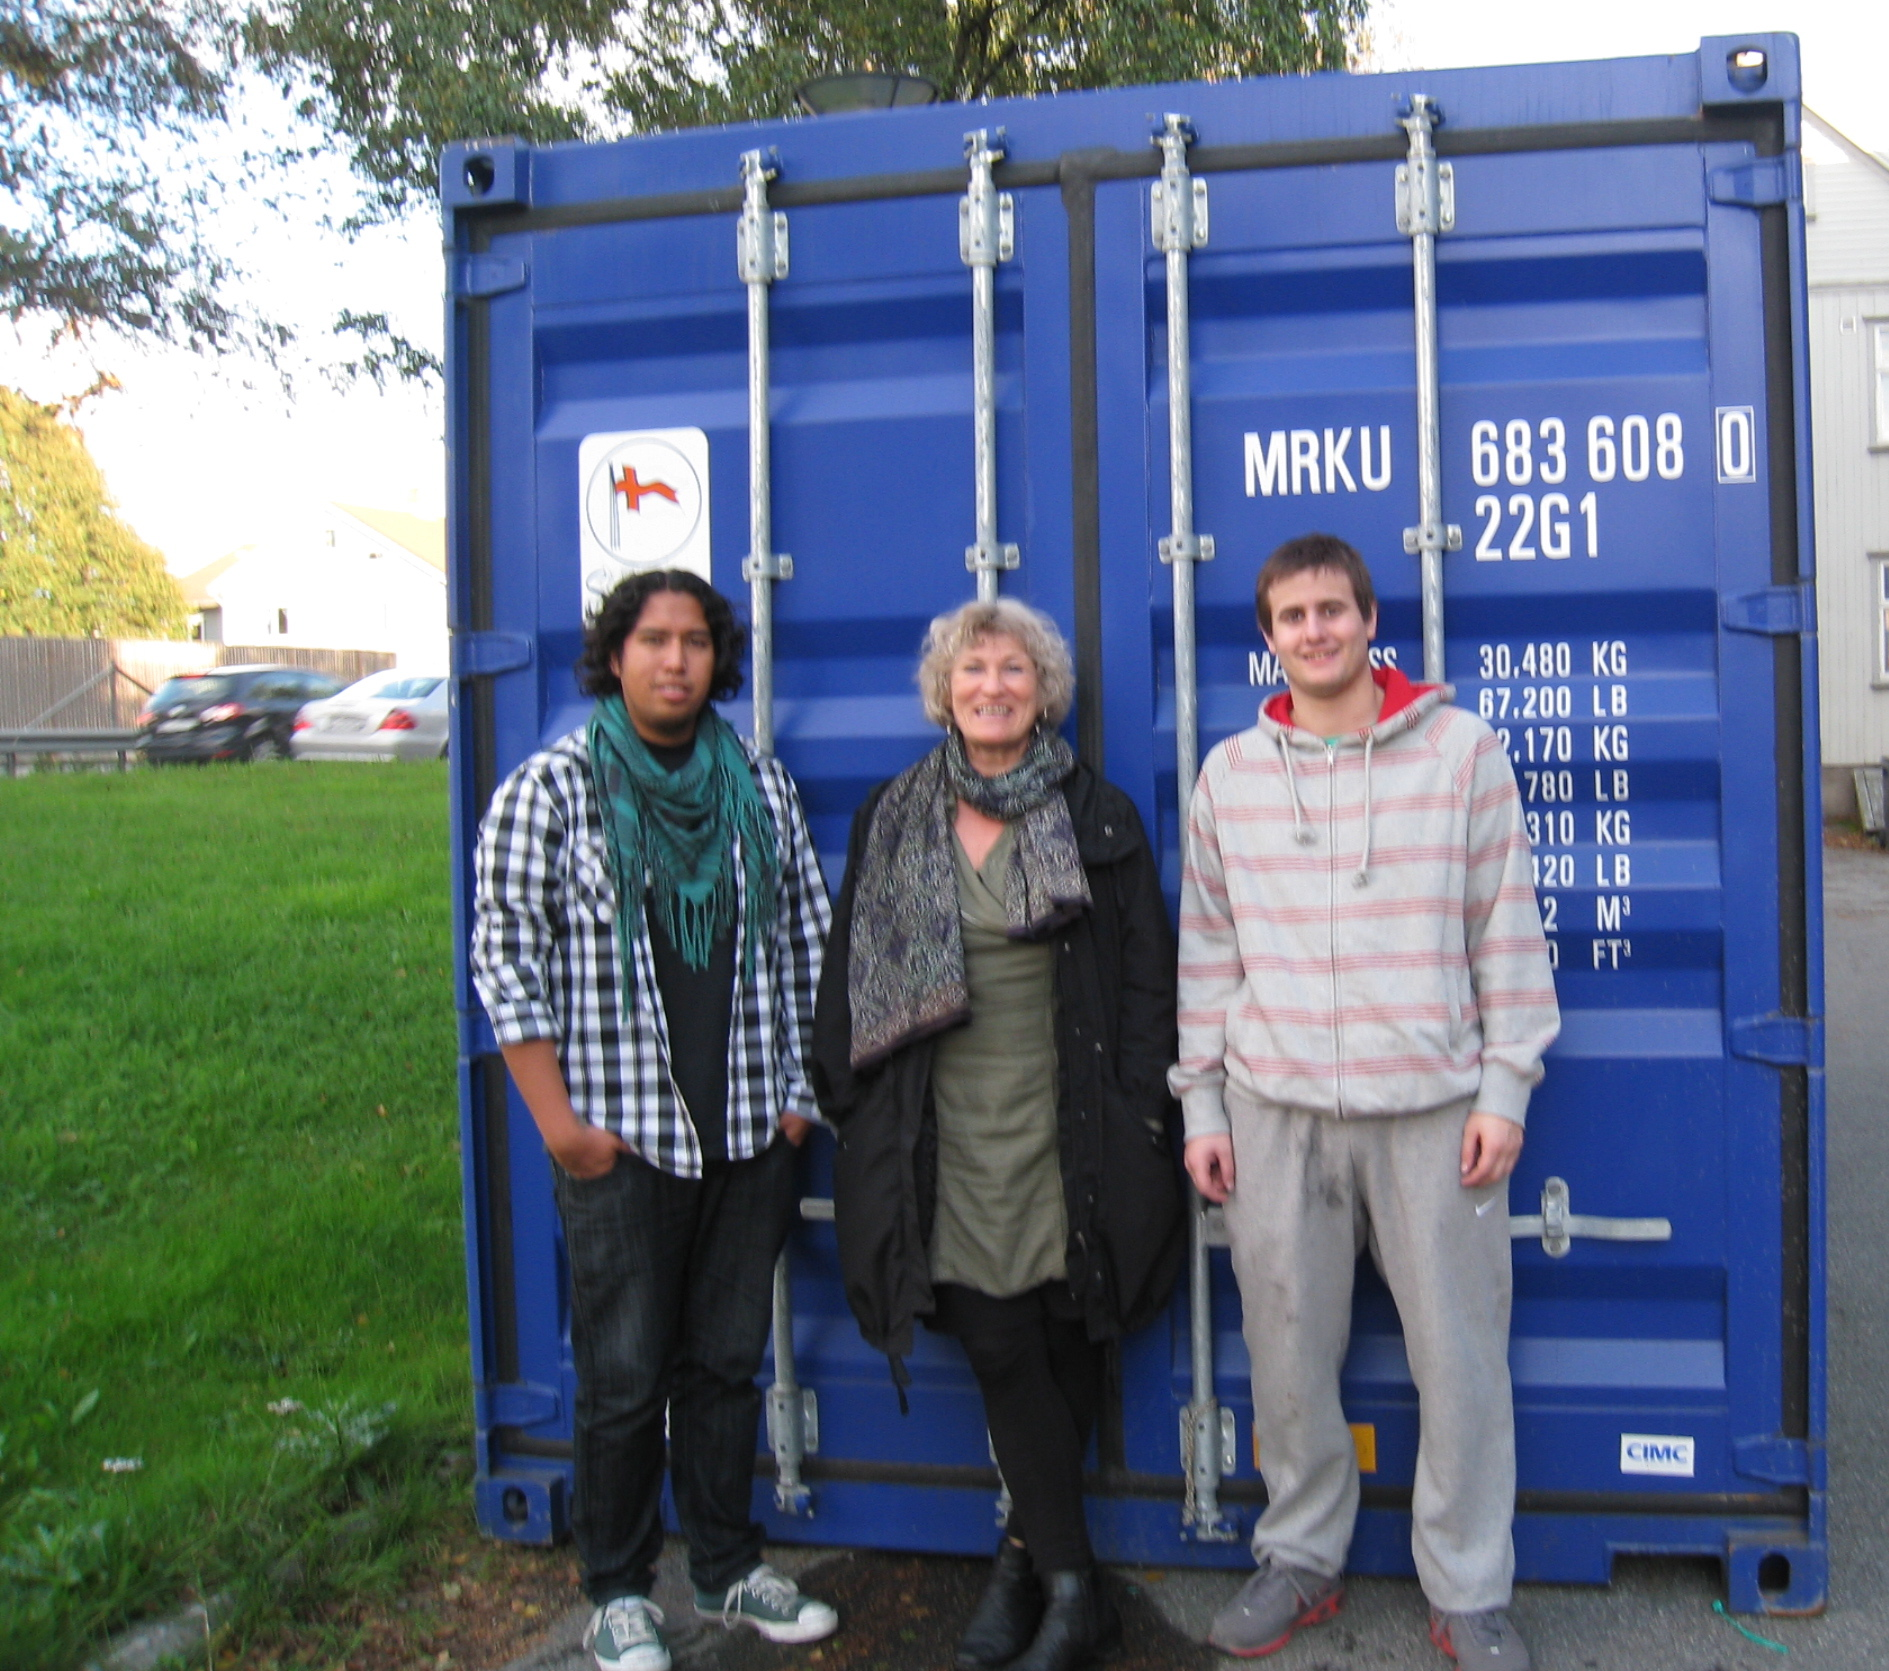 David, Marianne og Andres foran forseglet container